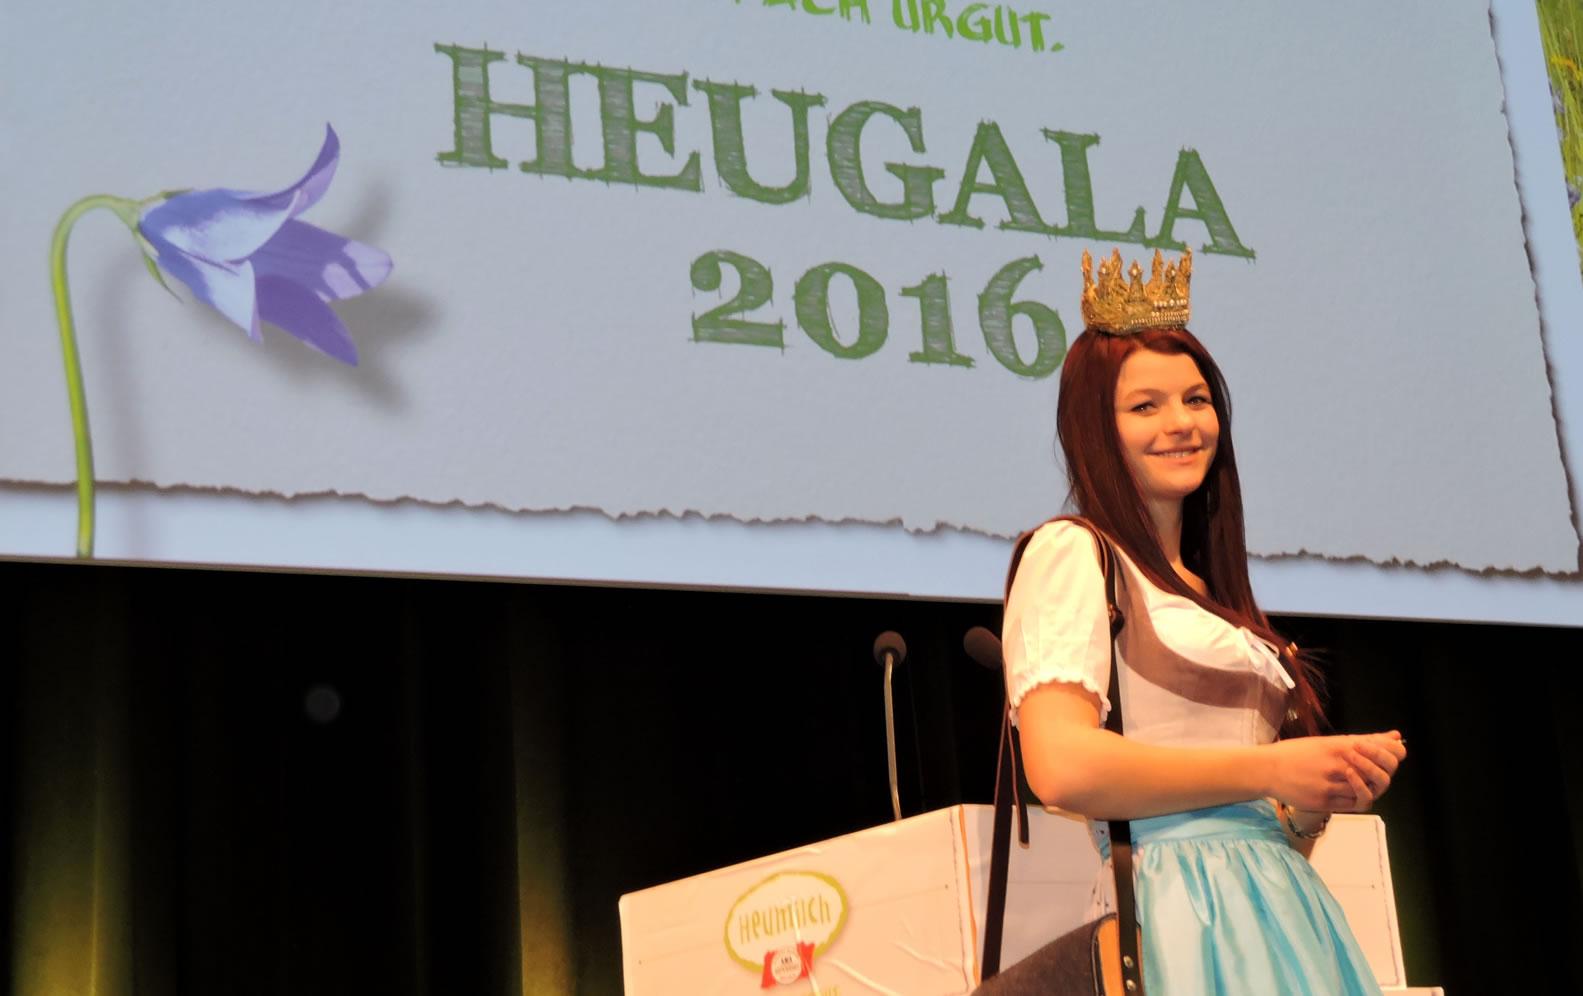 Heumilchgala 2016, Bio-Heu-Region (27)